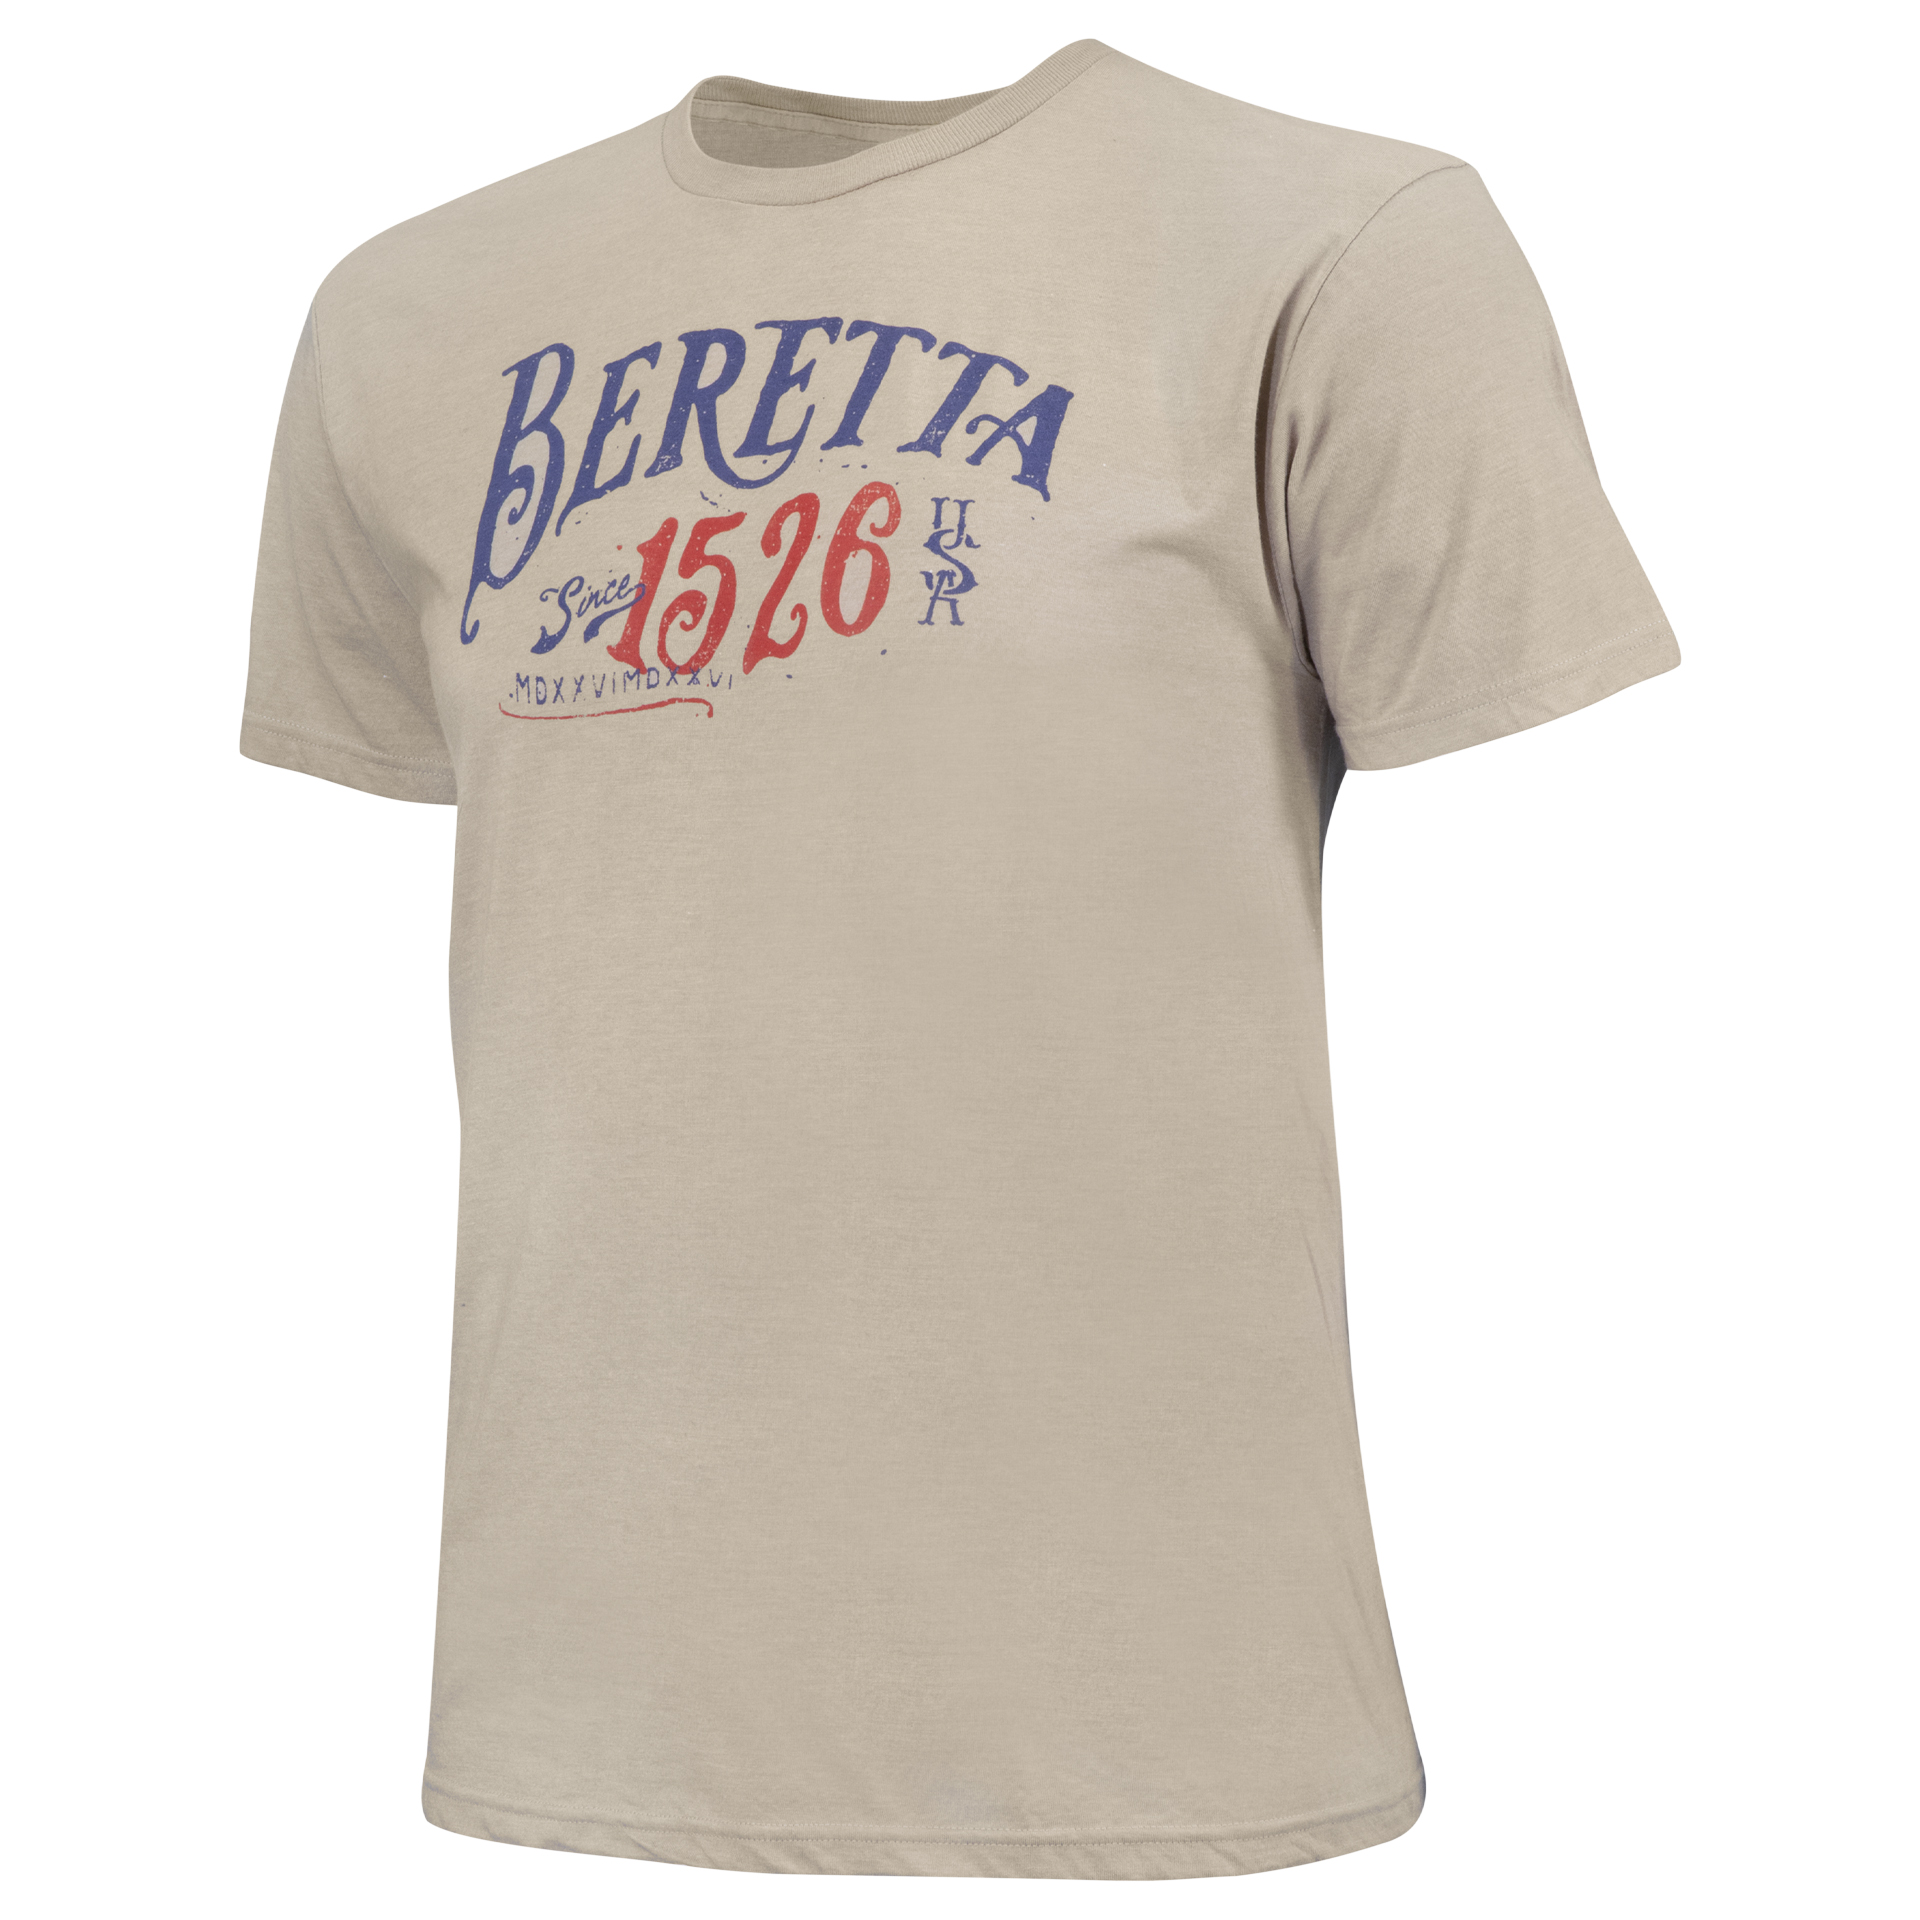 Image of BerettaUSA | 1526 Logo T-Shirt Stone, Cotton, Size: 2XL